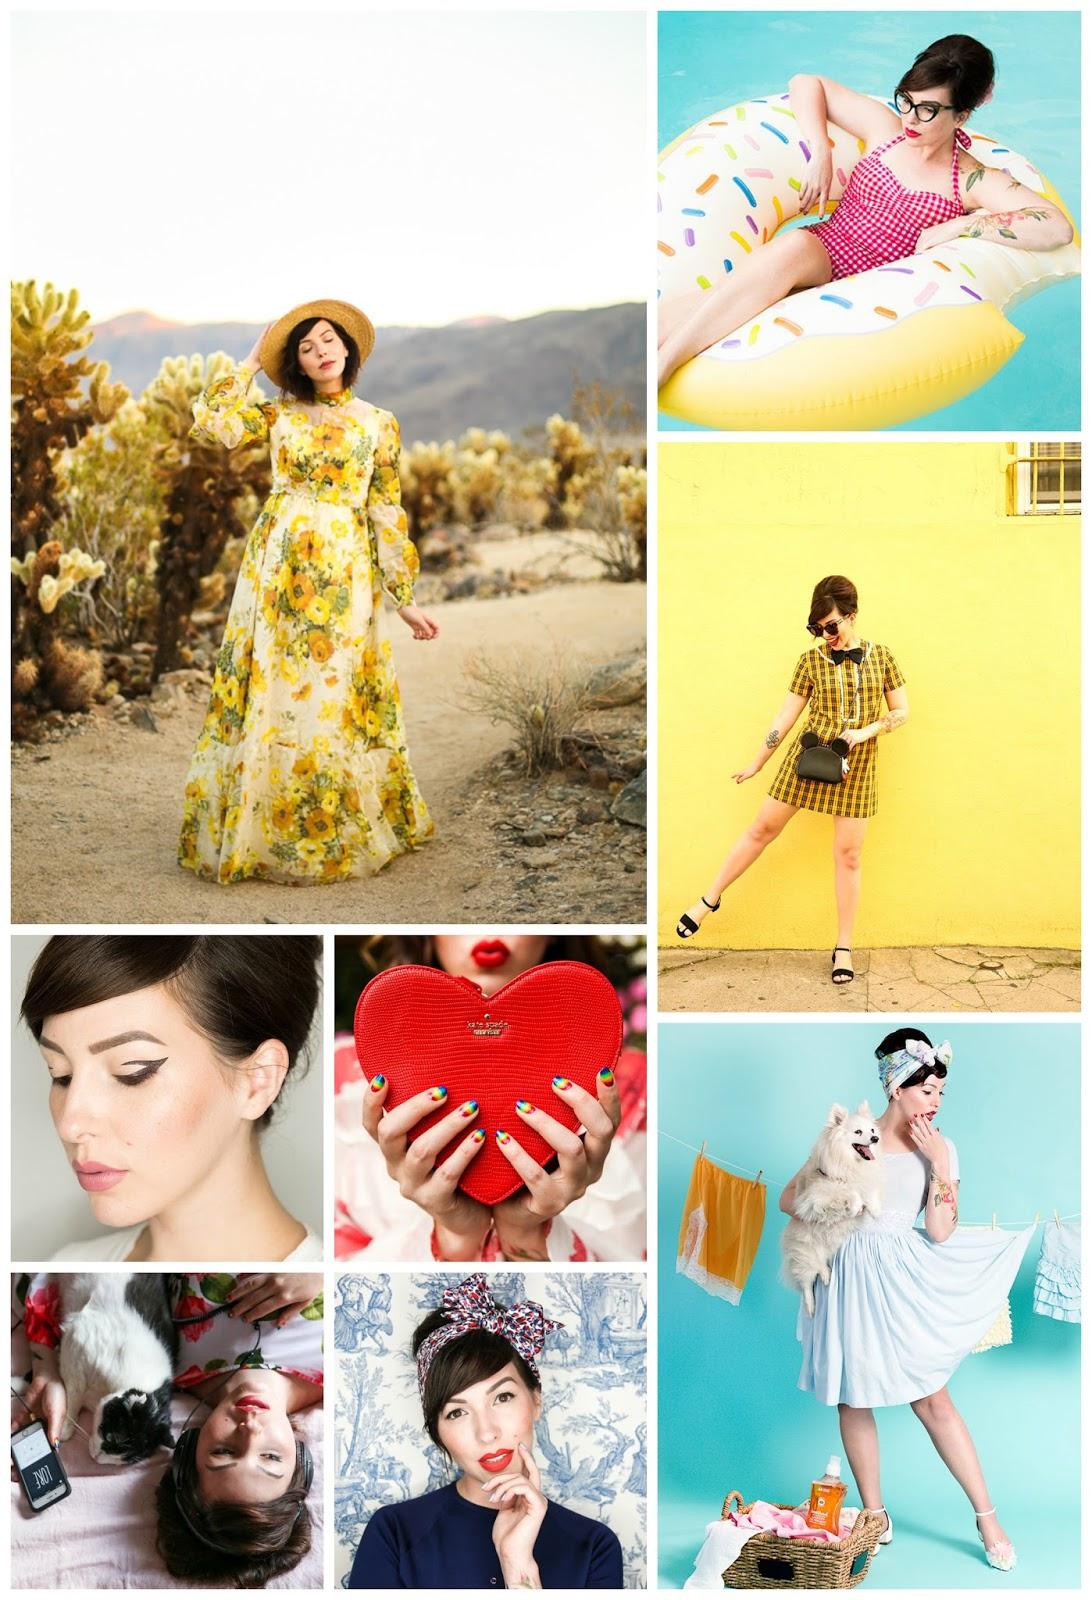 blog crush, blogger crush, favourite blogger, fashion blogger, lifestyle blogger, blogger recommendations, best bloggers, Keiko Lynn, USA blogger, American blogger